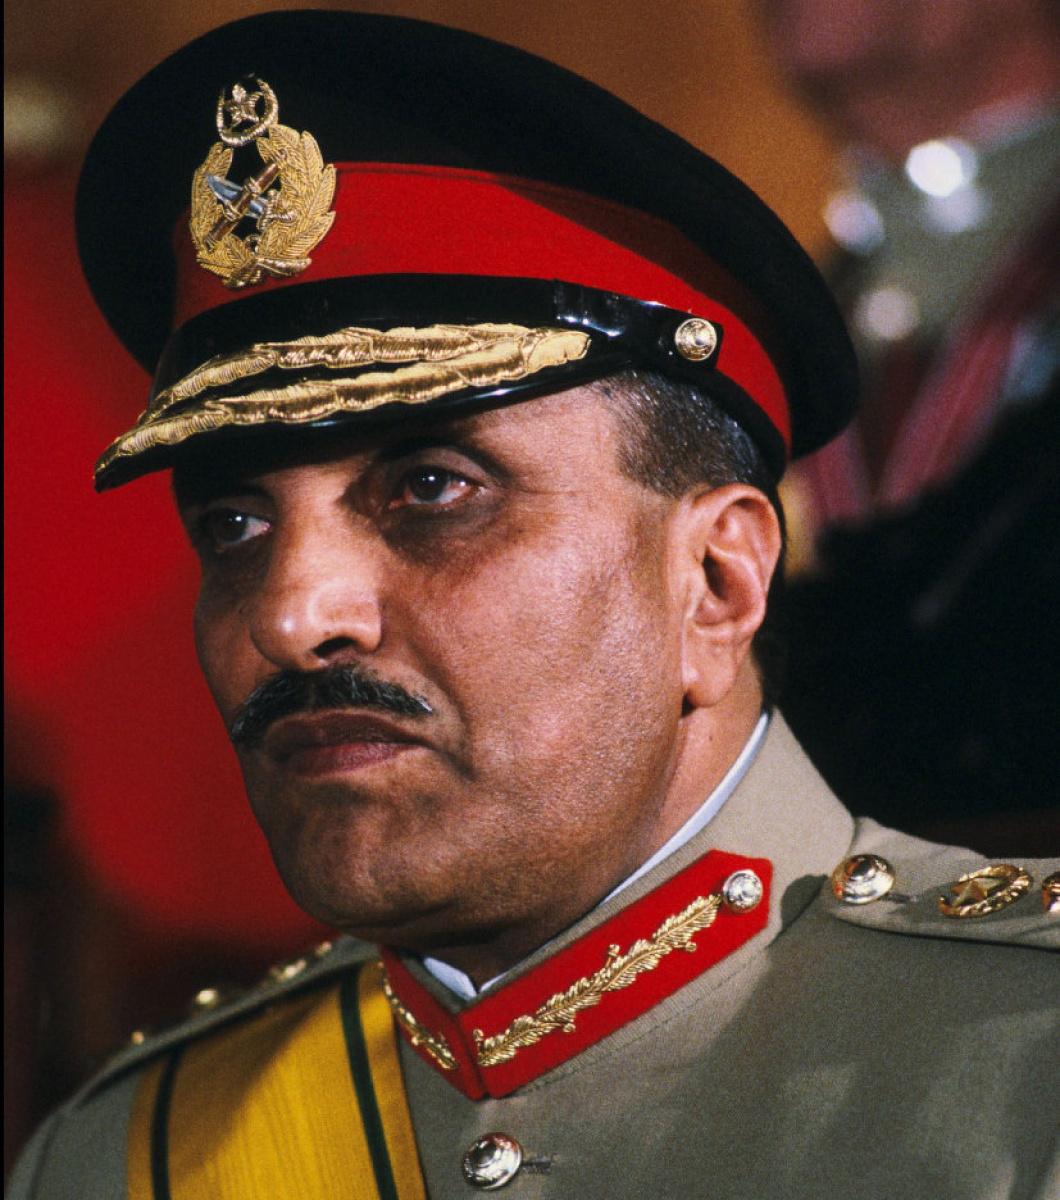 general muhammad zia ul haq essay General muhammad zia-ul-haq (punjabi, urdu: محمد ضياء الحق  august 12, 1924 – august 17, 1988), was a pakistani general officer and military dictator who served as the sixth president of pakistan.